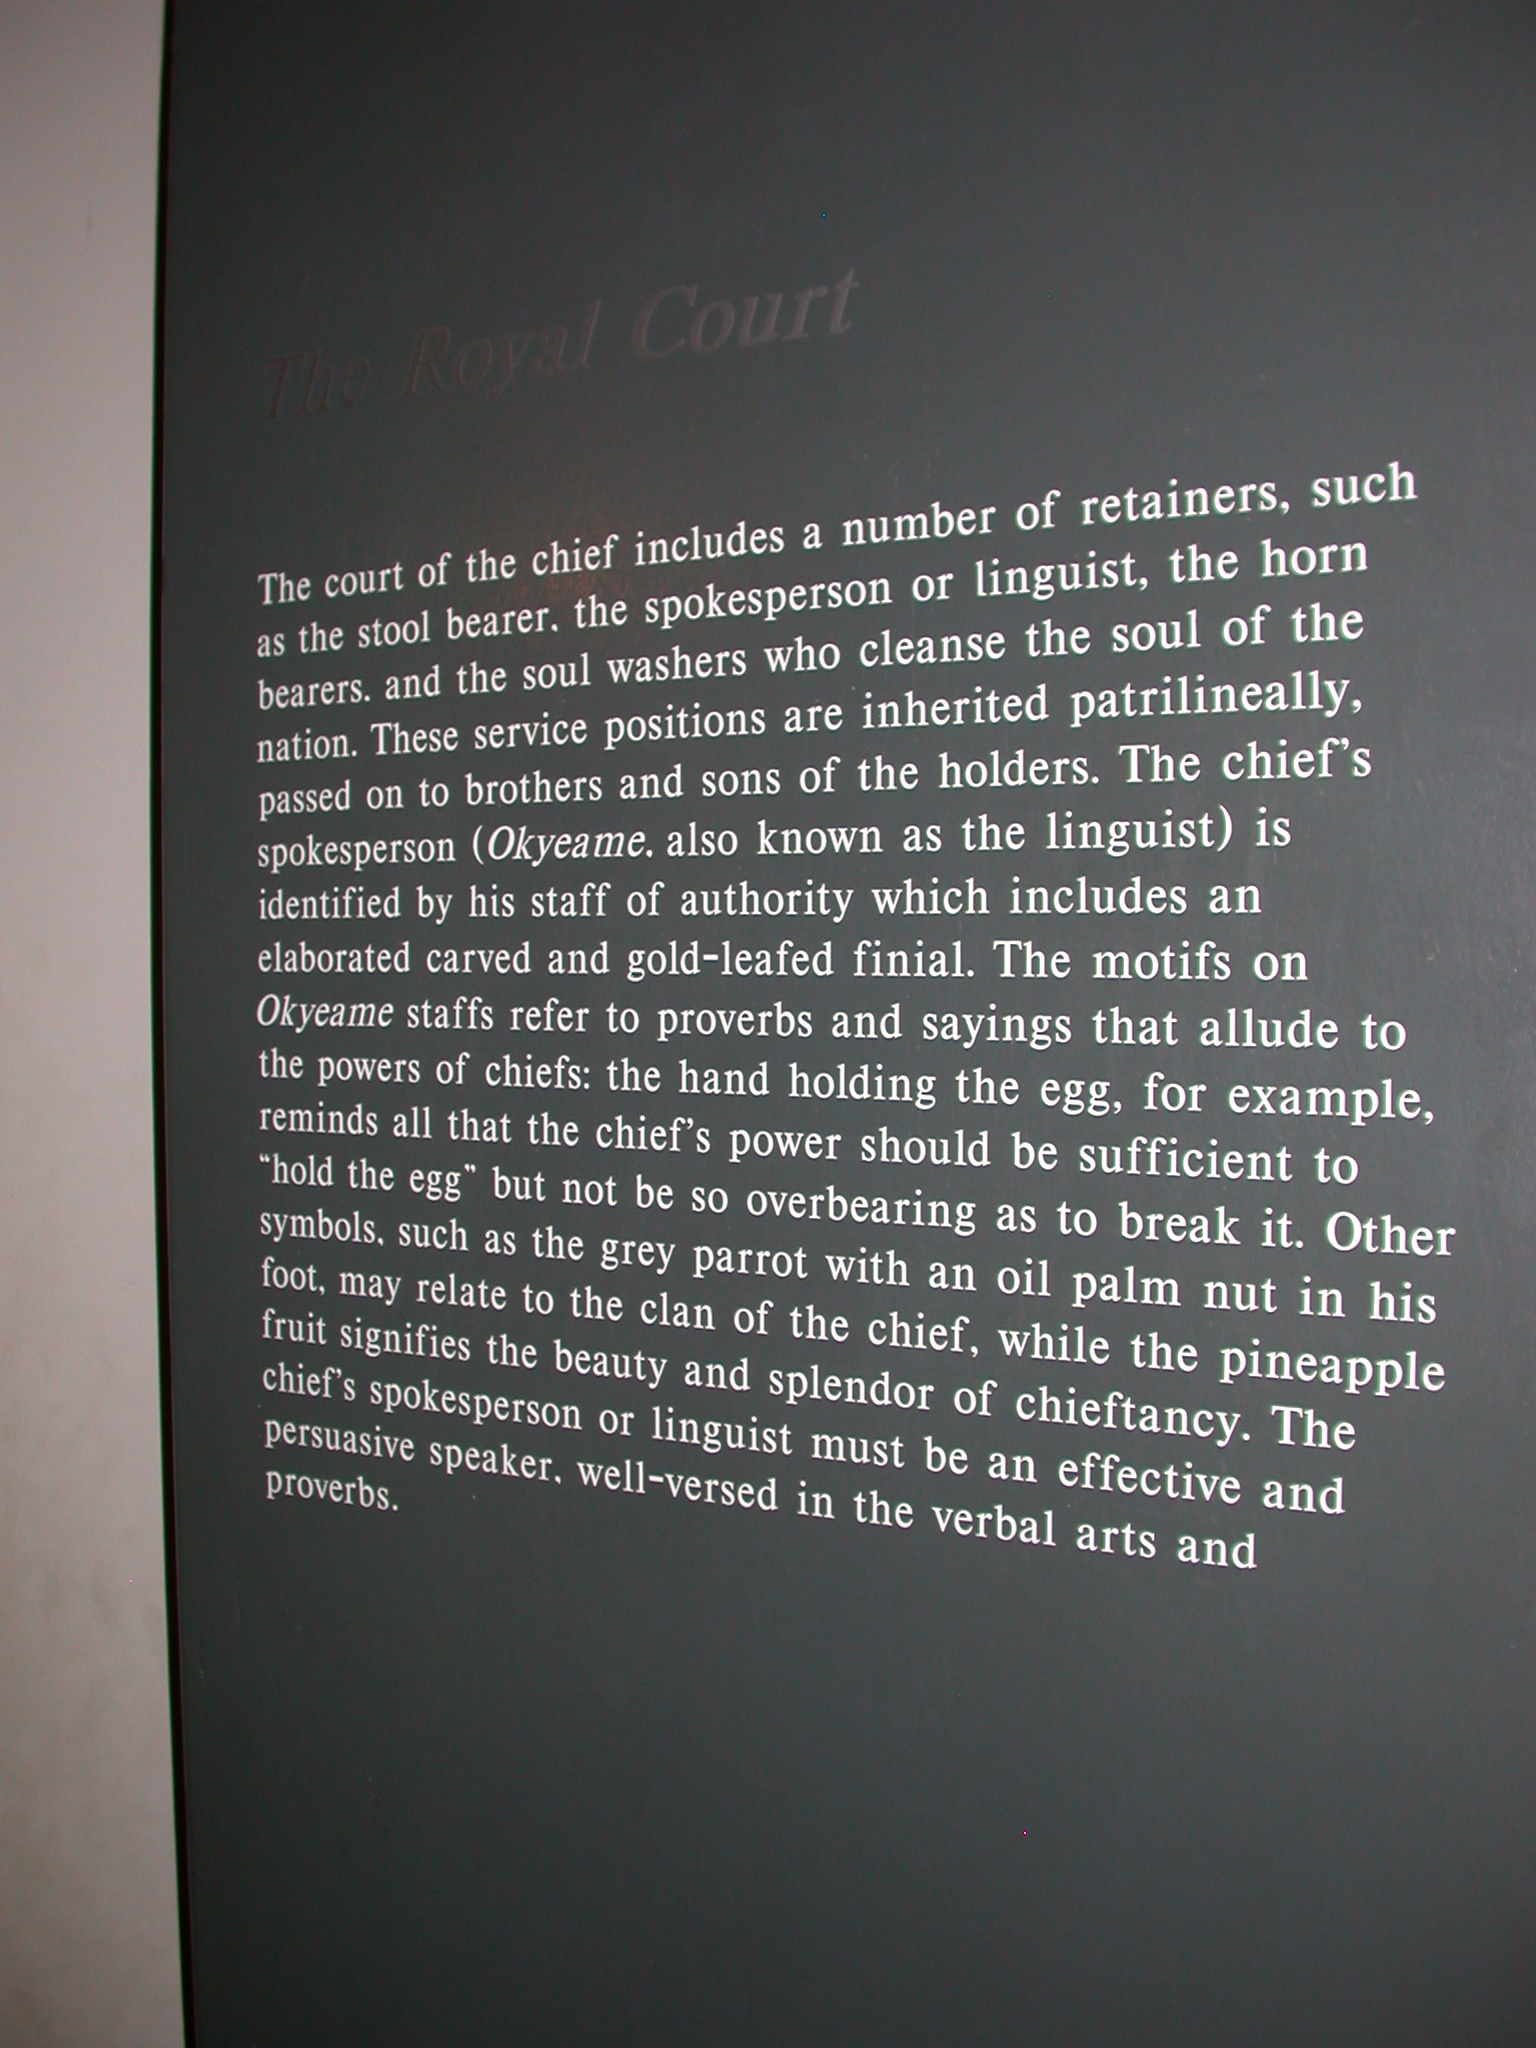 Akan Royal Court Description, Cape Coast Slave Fort Museum, Cape Coast, Ghana